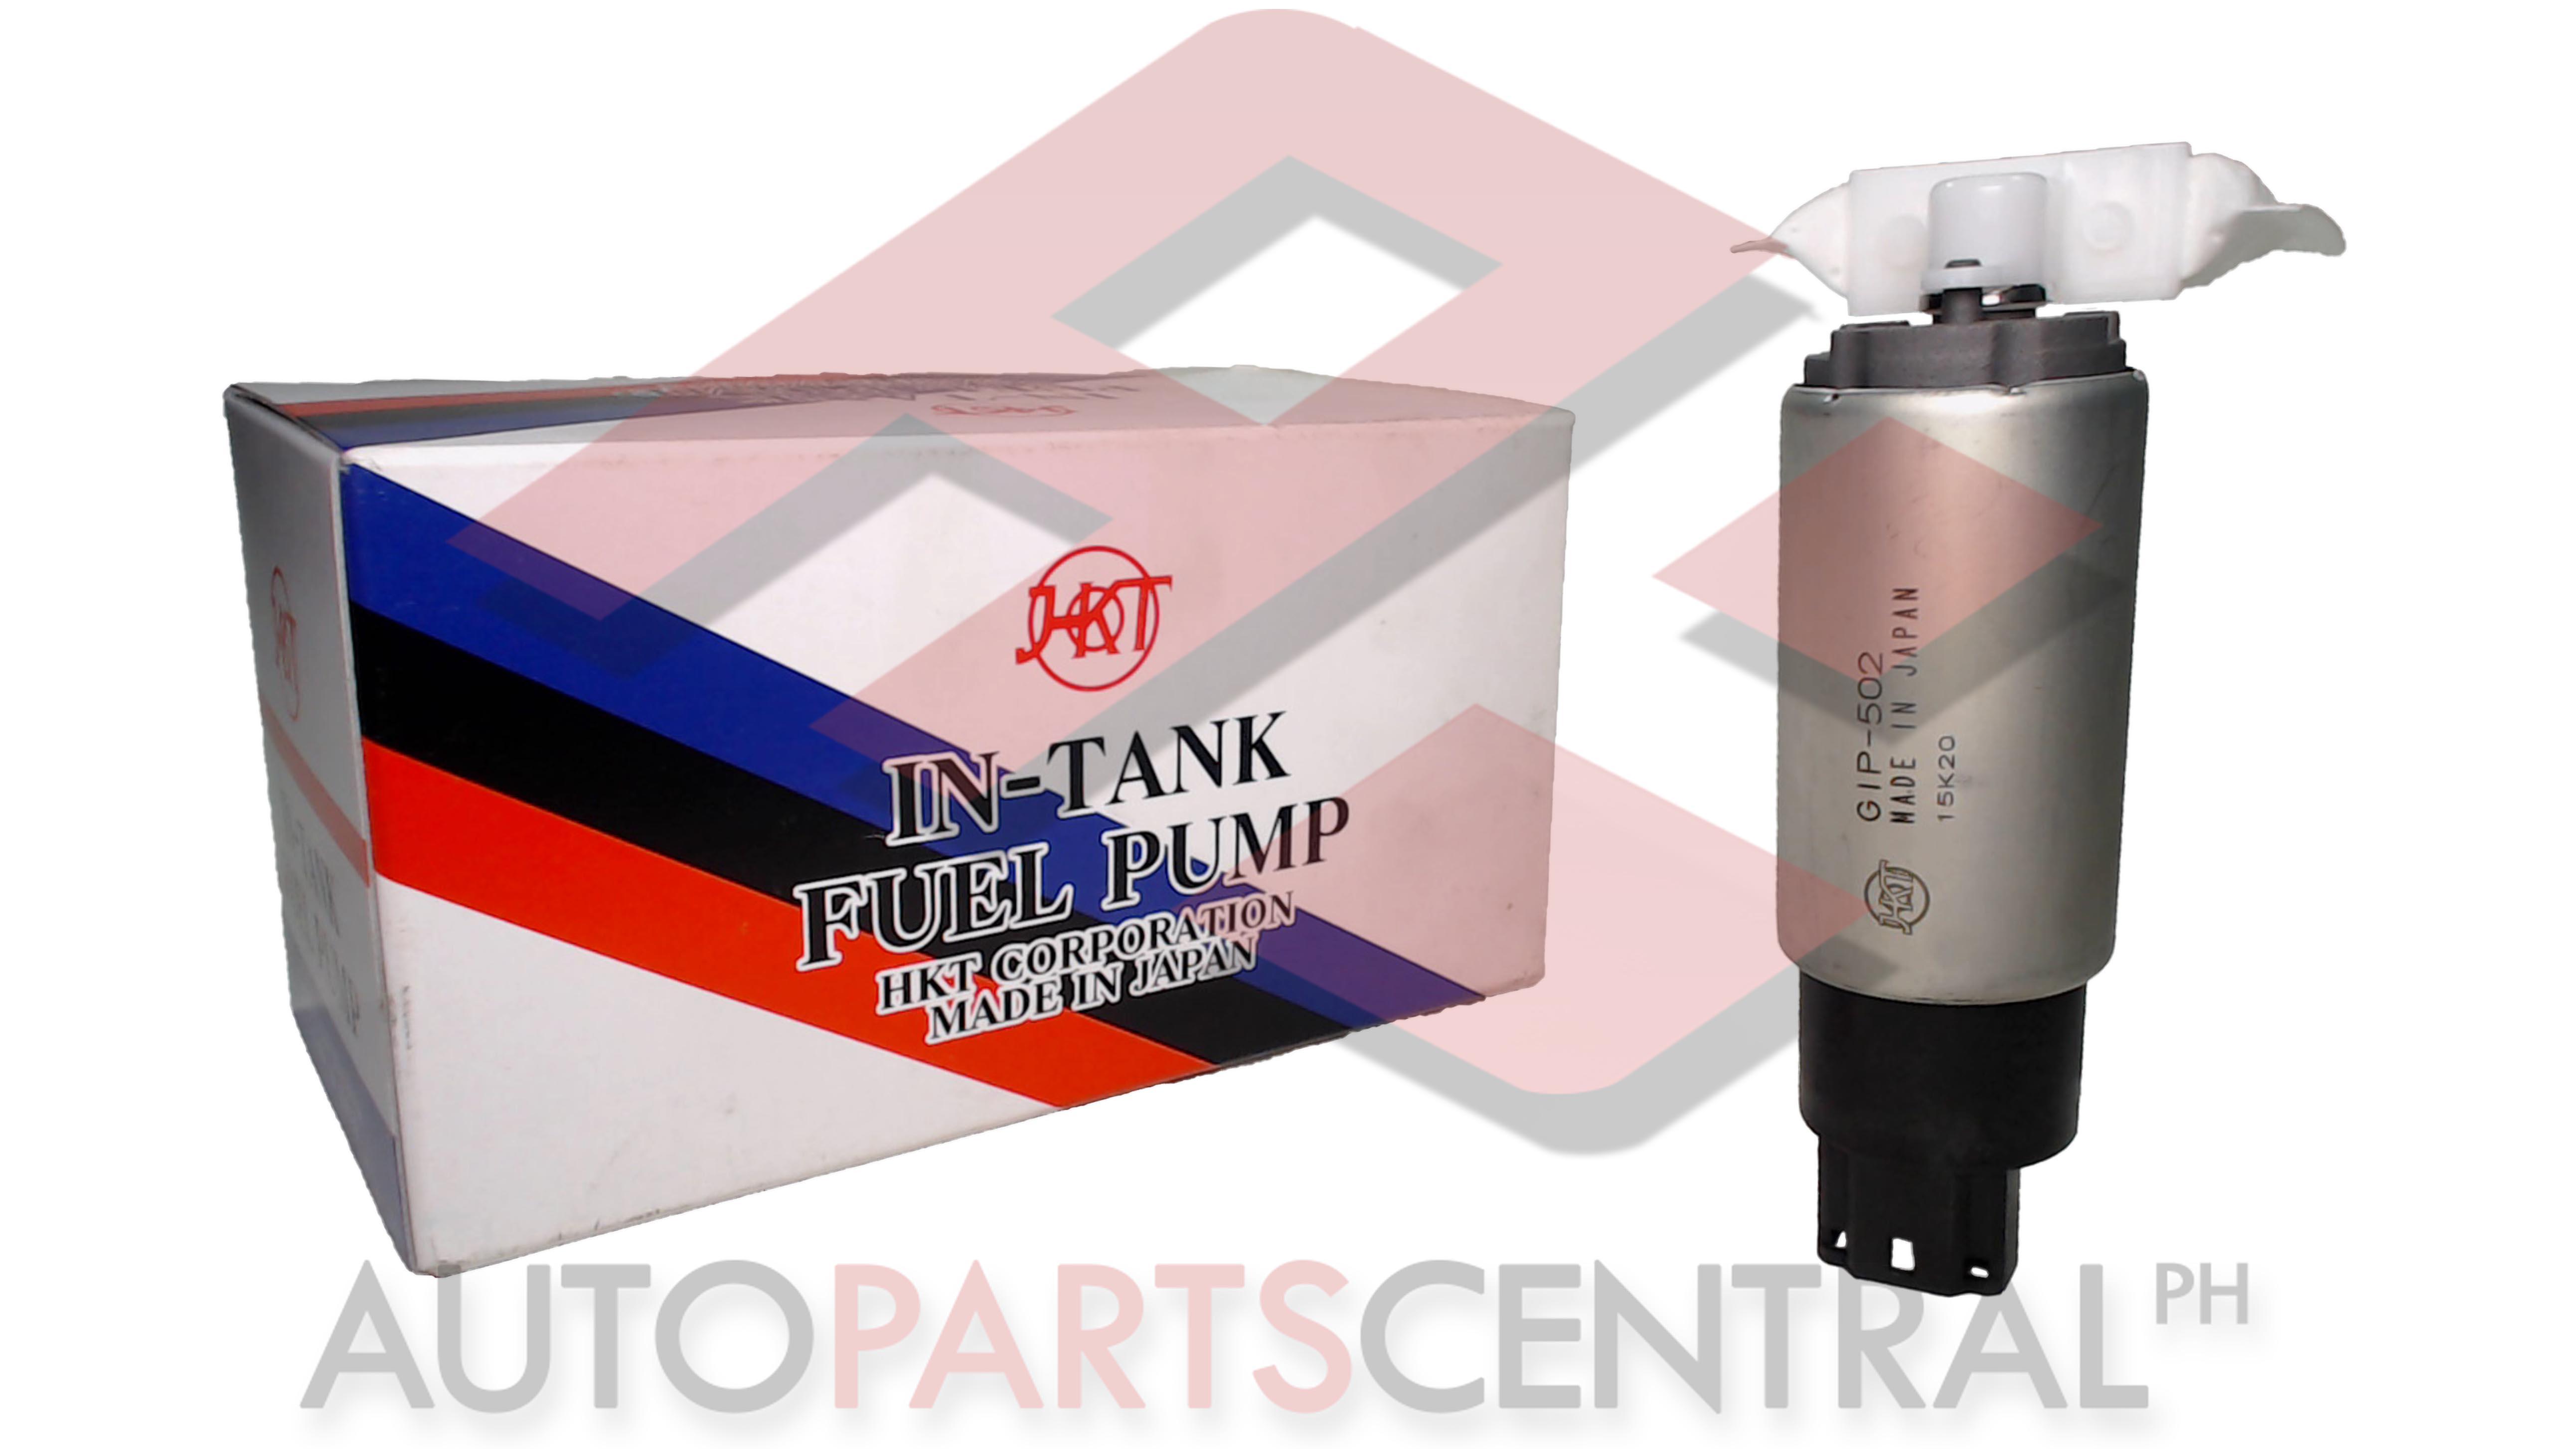 Fuel Pump Hkt Efp Gip505 Toyota Fortuner Autopartscentralph Fuse Box Location Tank Gip 501 Big Universal